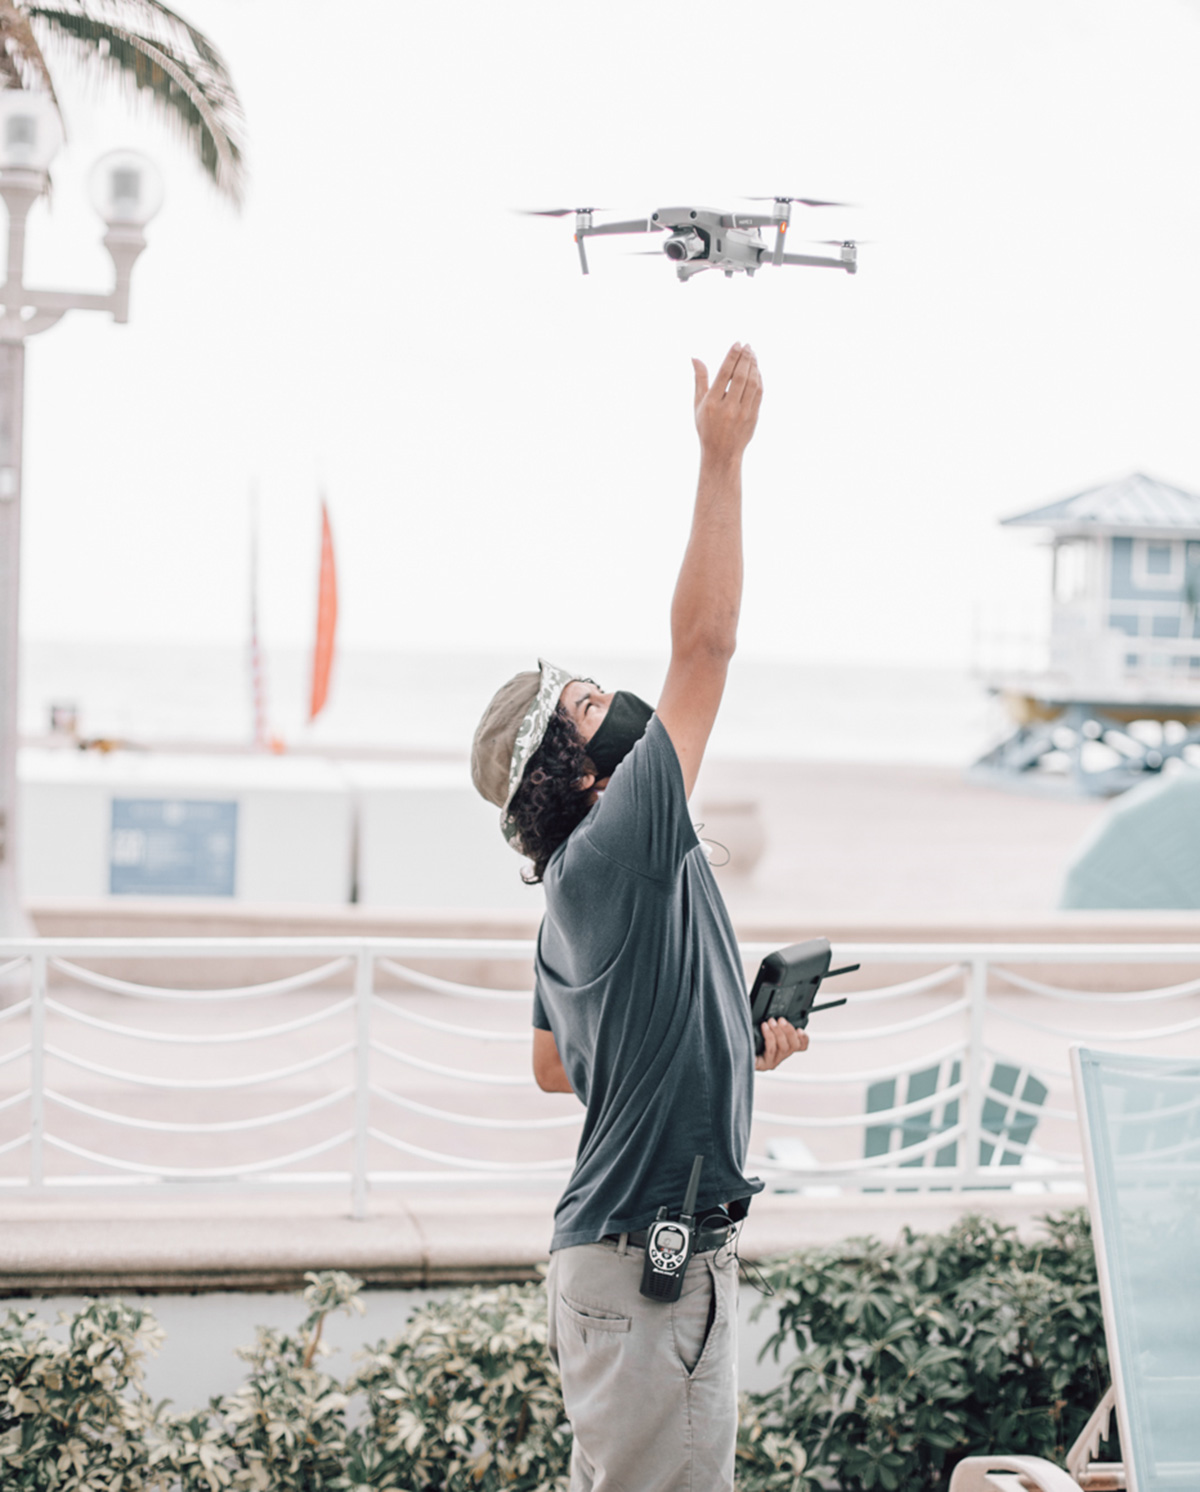 Karim-Dakkon_Drone-Filmmaking_FeaturedOnStudentFilmmakers.jpg